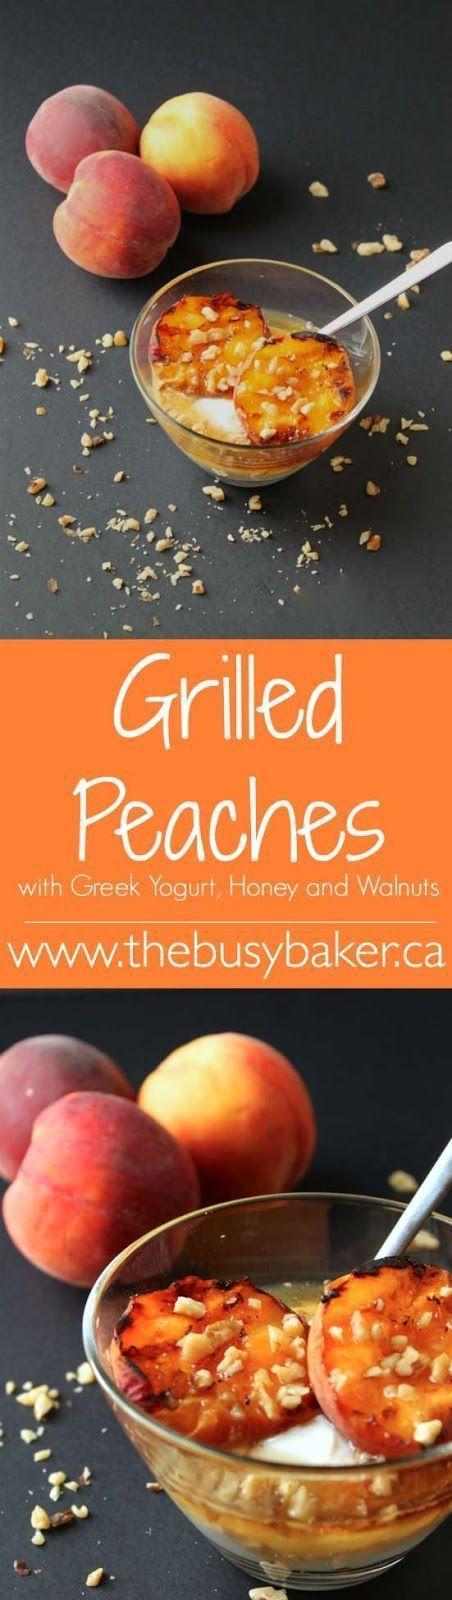 Grilled peaches, Greek yogurt and Yogurt on Pinterest